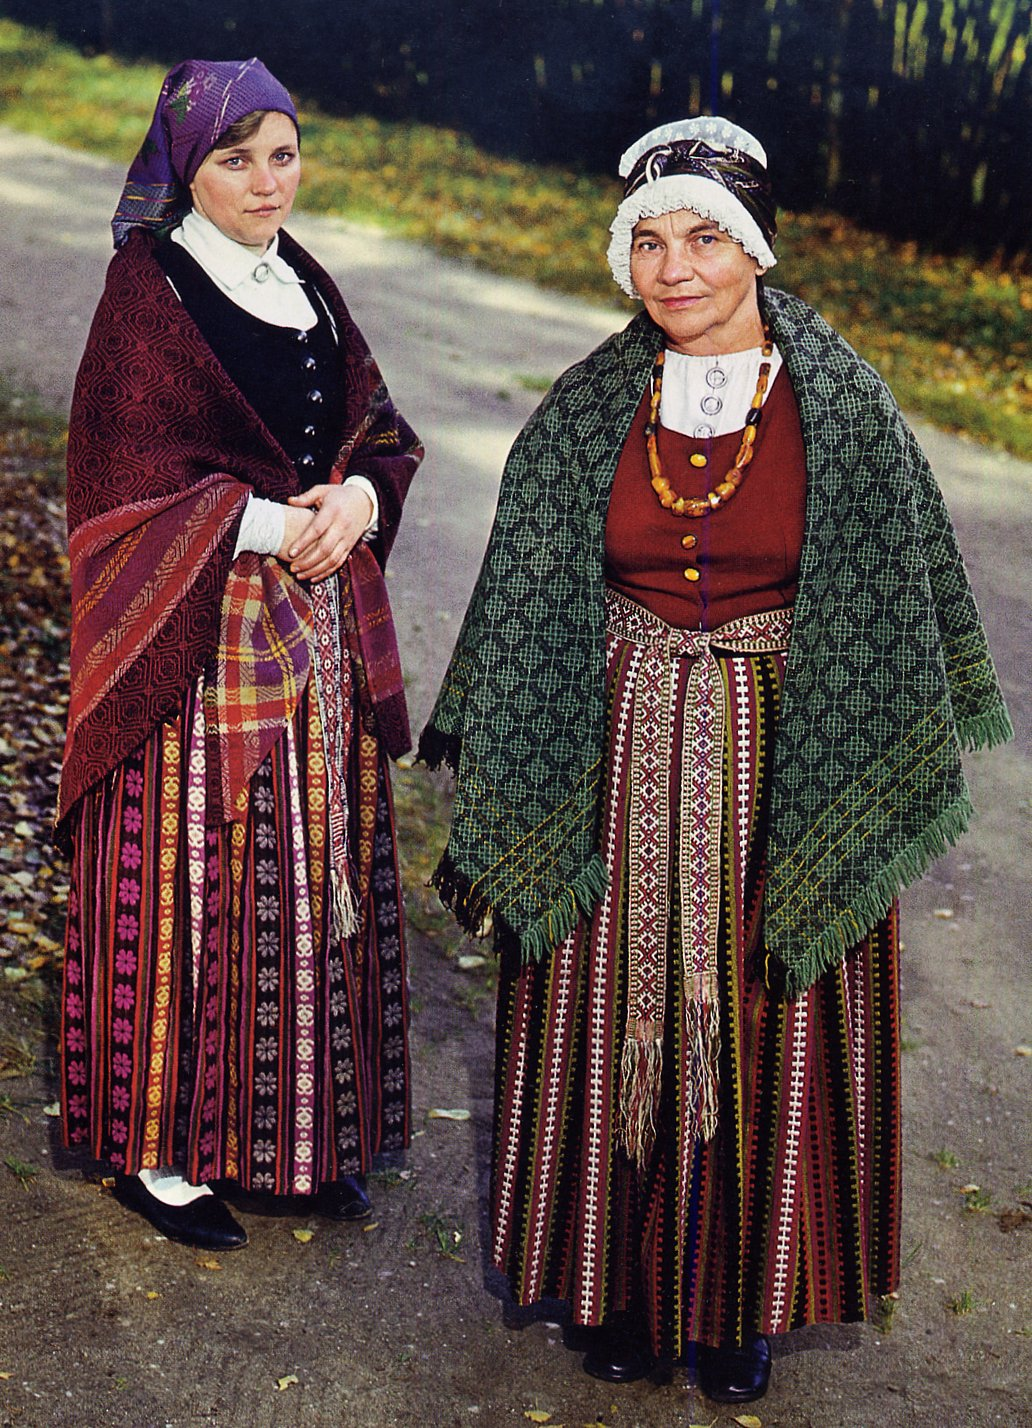 Islamic dress in Europe